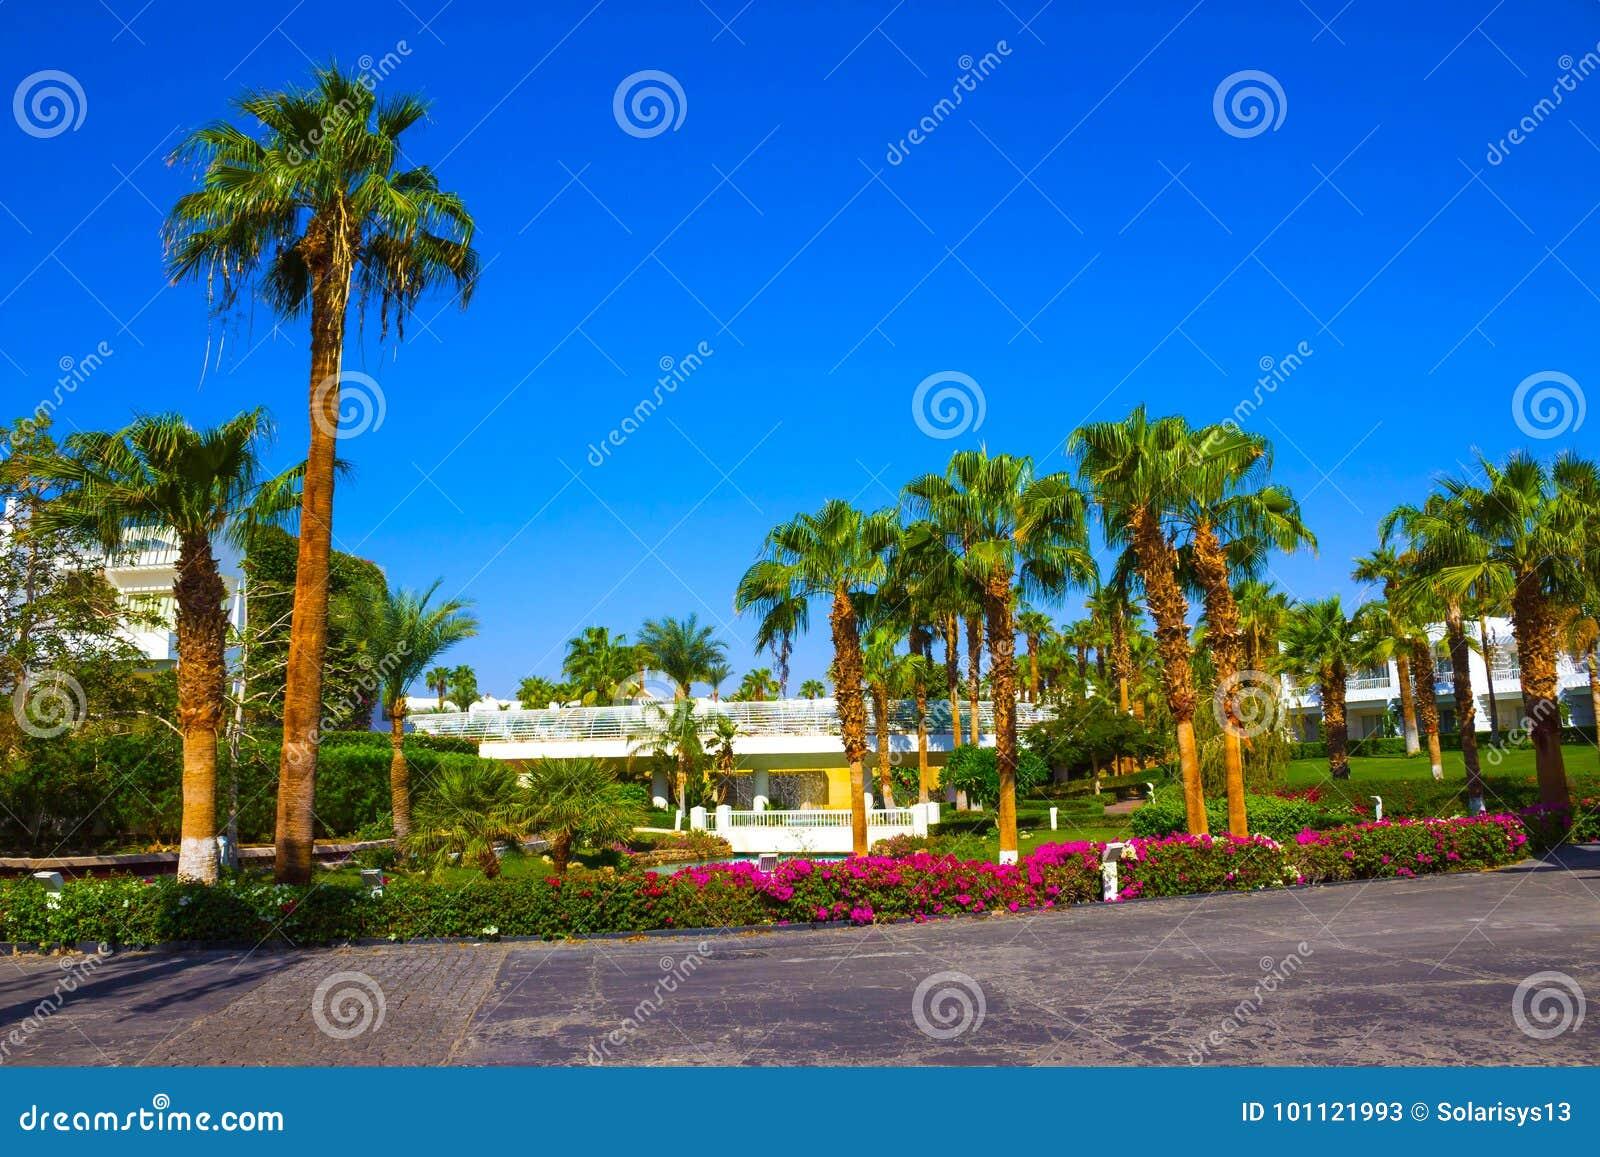 Sharm El Sheikh, Egypt - September 26, 2017: Buildings and Area Hotel Monter Carlo Resort Sharm El Sheikh